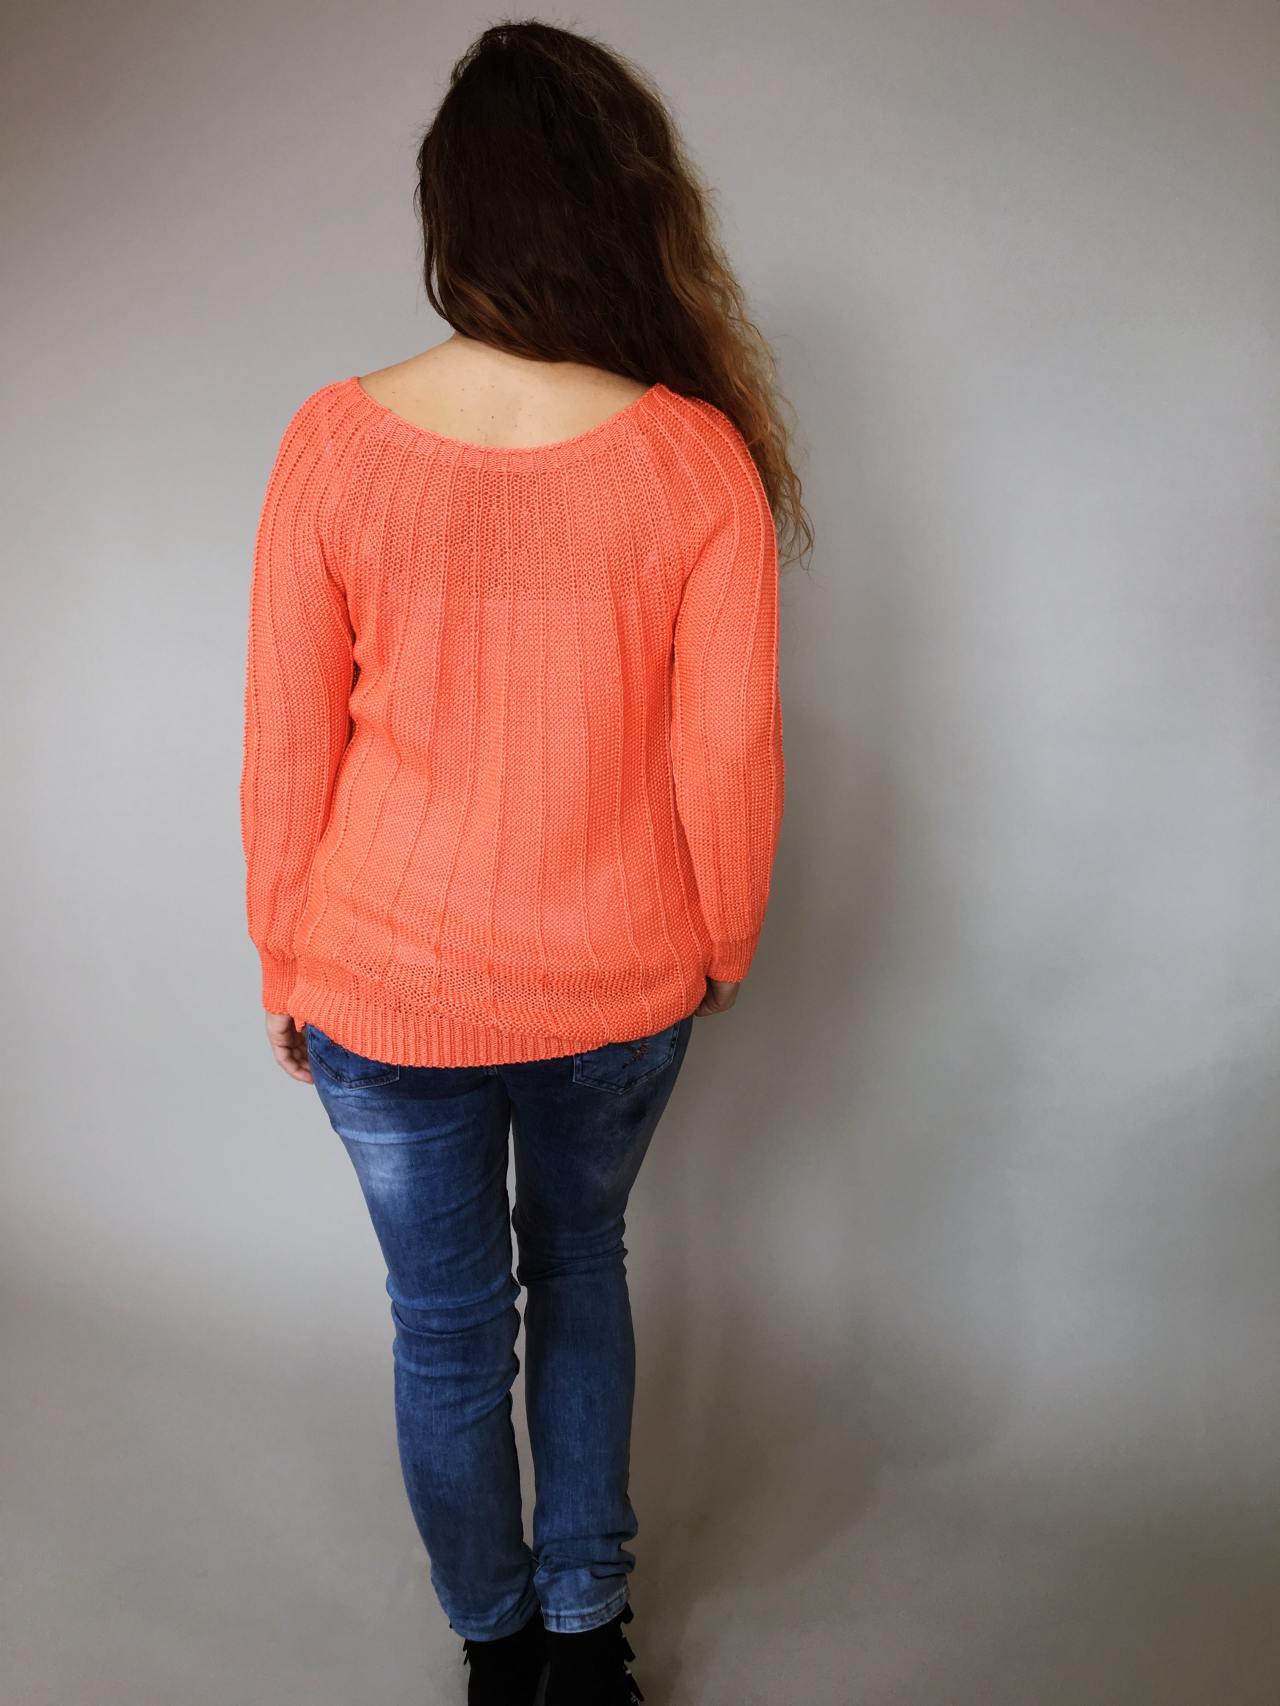 Halenka Pearls oranžová 02